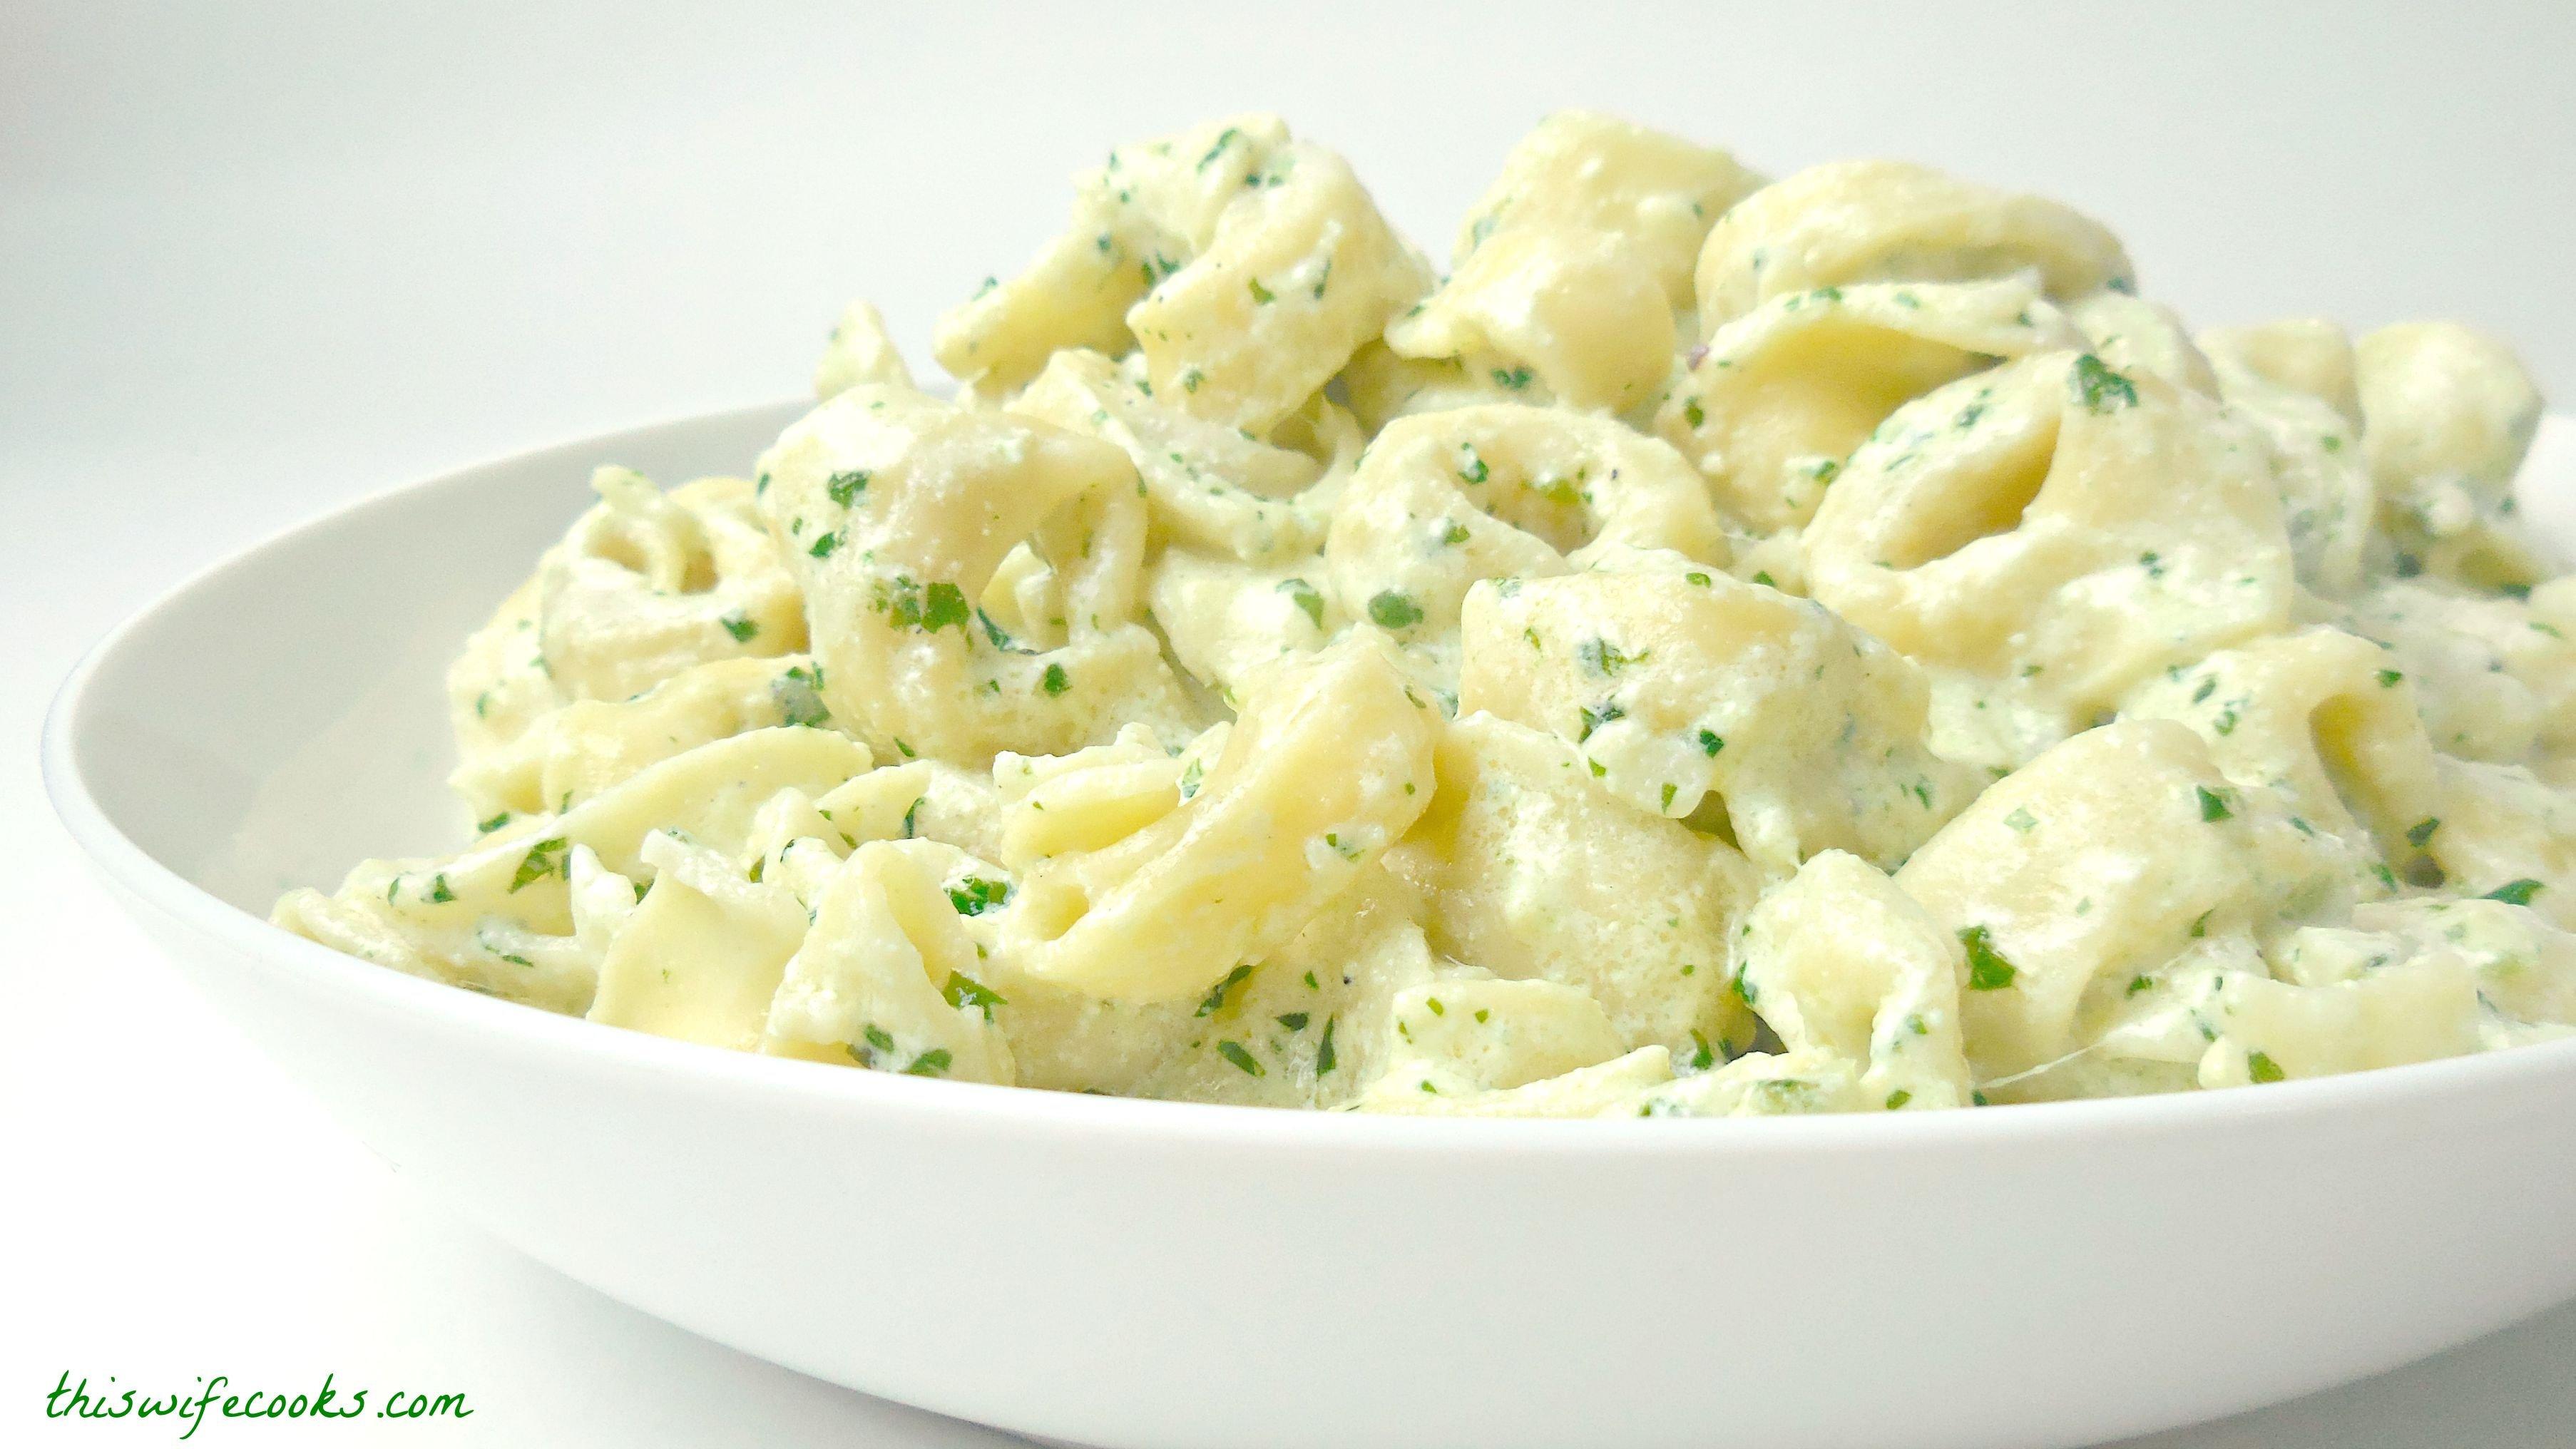 Vegan Tortellini in Creamy Pesto Sauce via @thiswifecooks